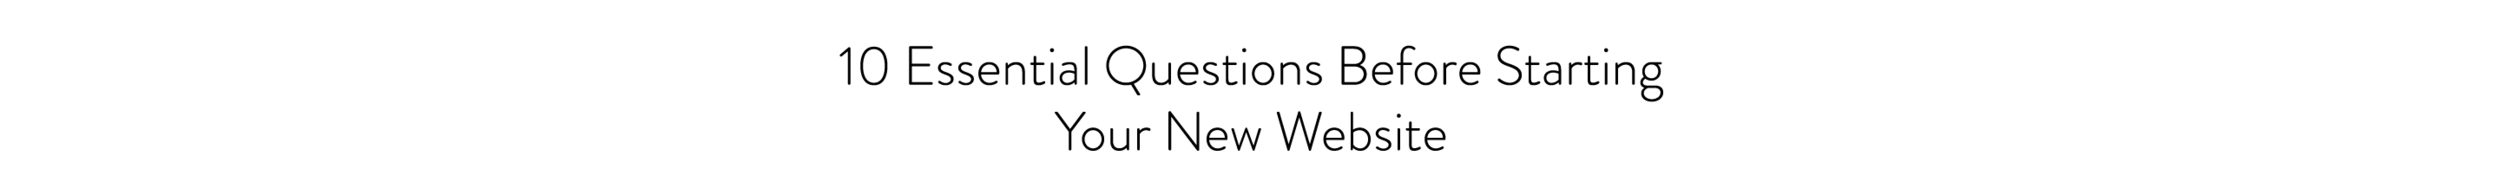 verge_logodesign_h2.png